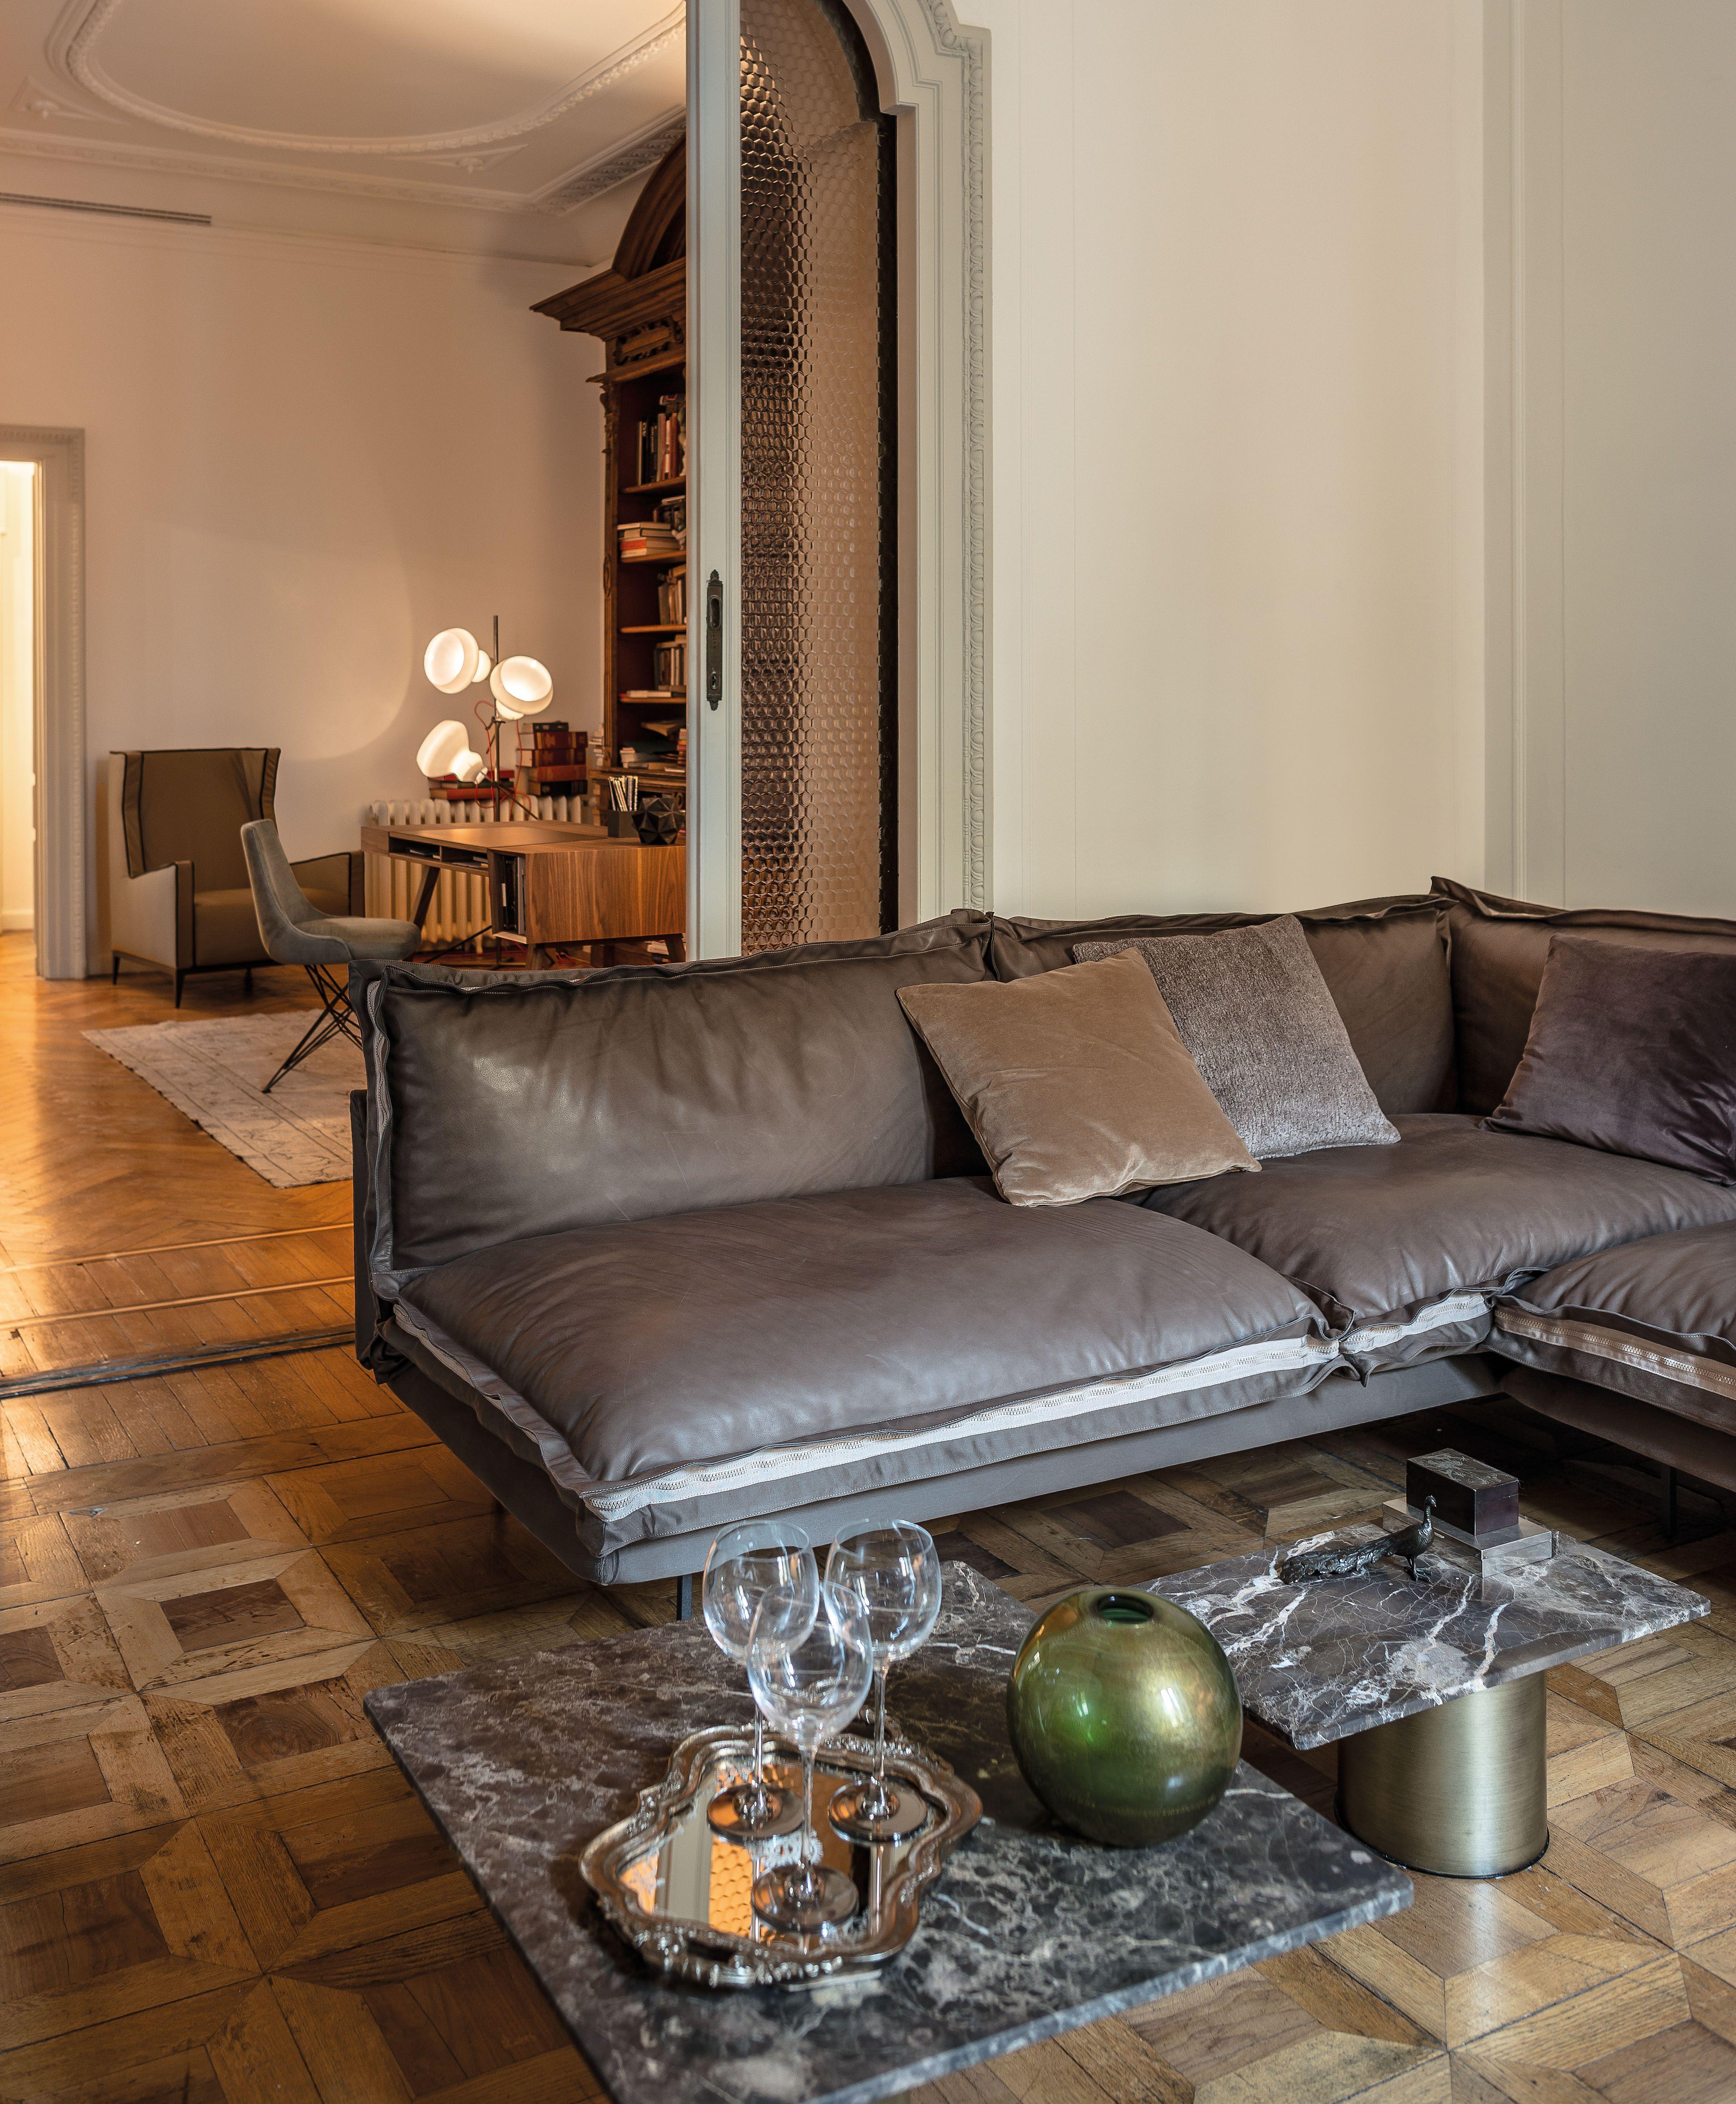 Ab Creative Scandicci the sofa auto-reverse by arketipo firenze, versatile and